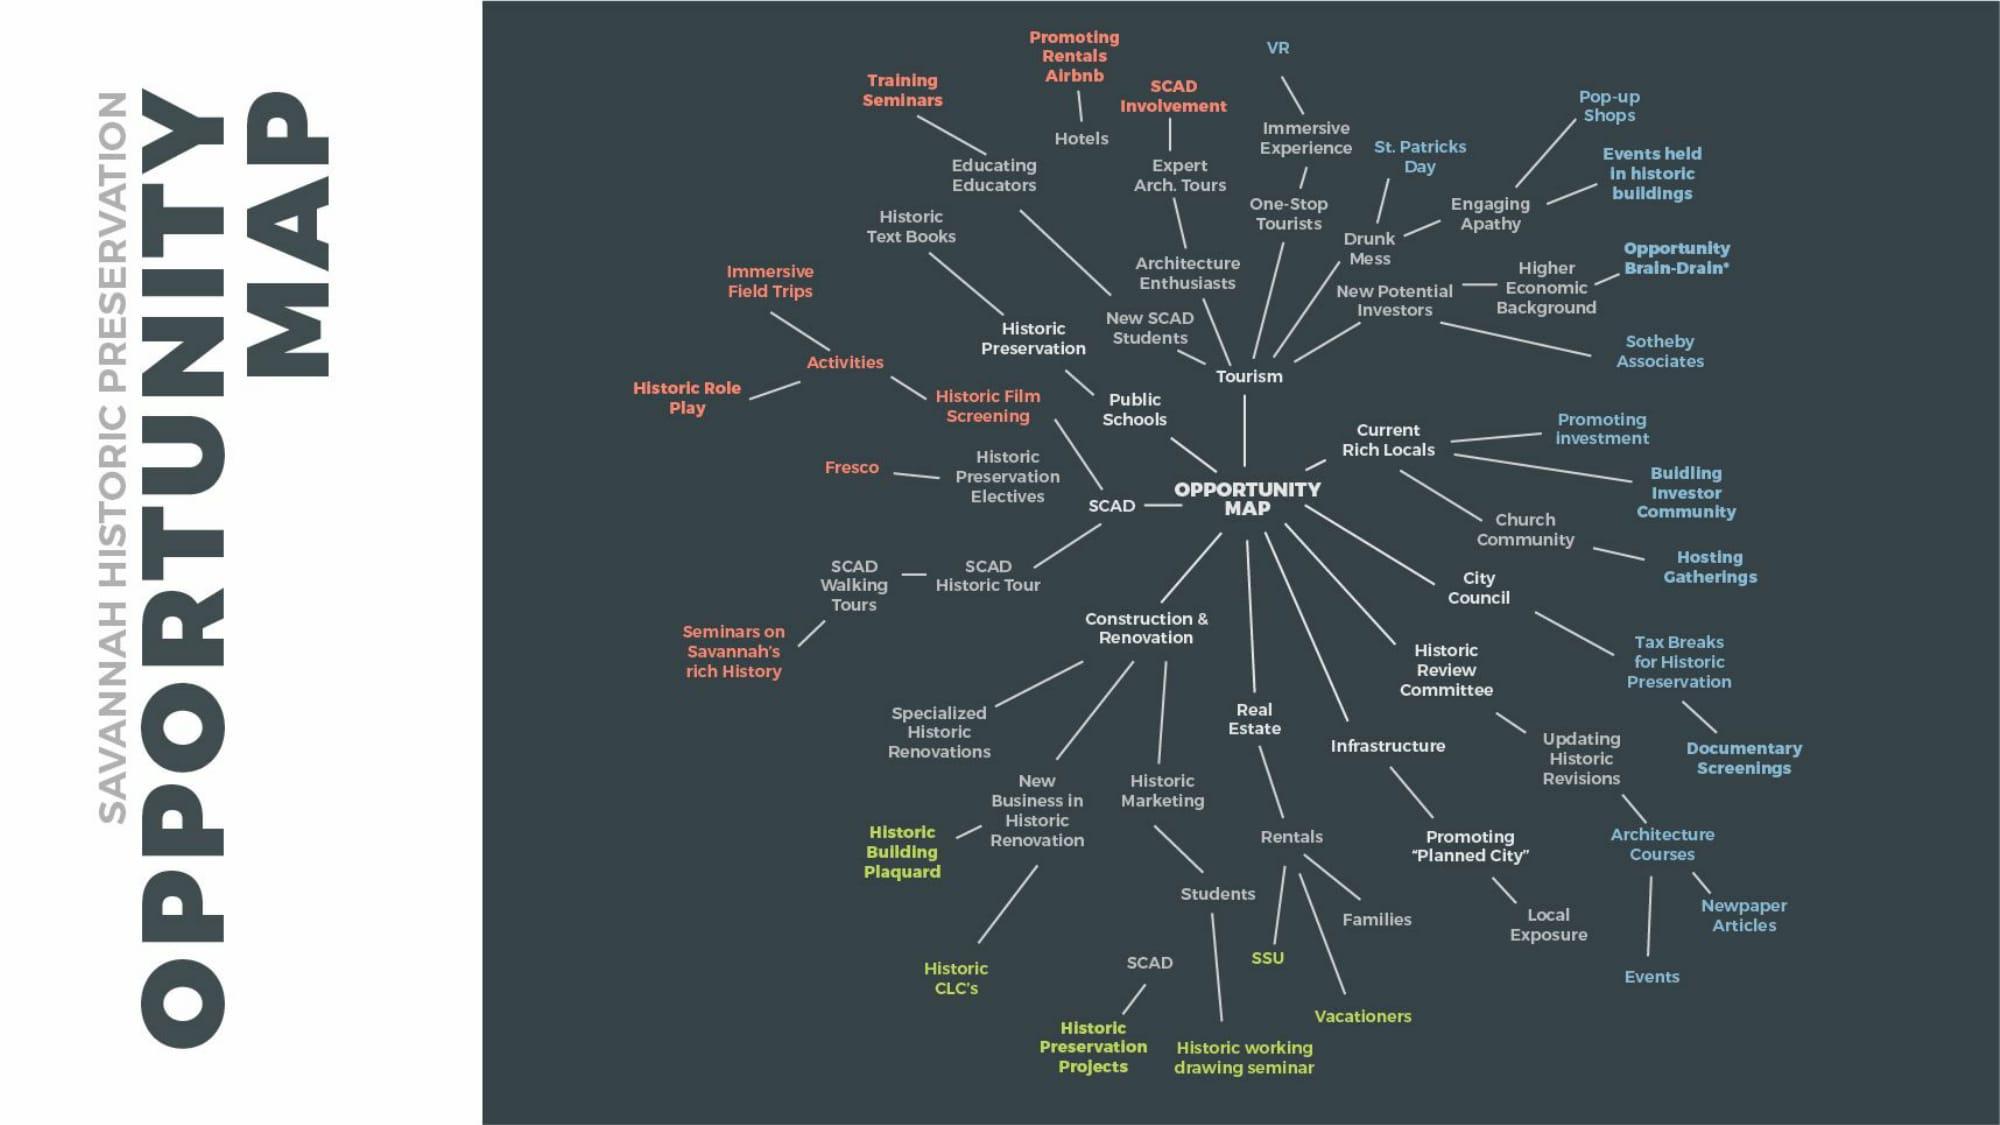 Darshini Shah Opportunity Mind Map